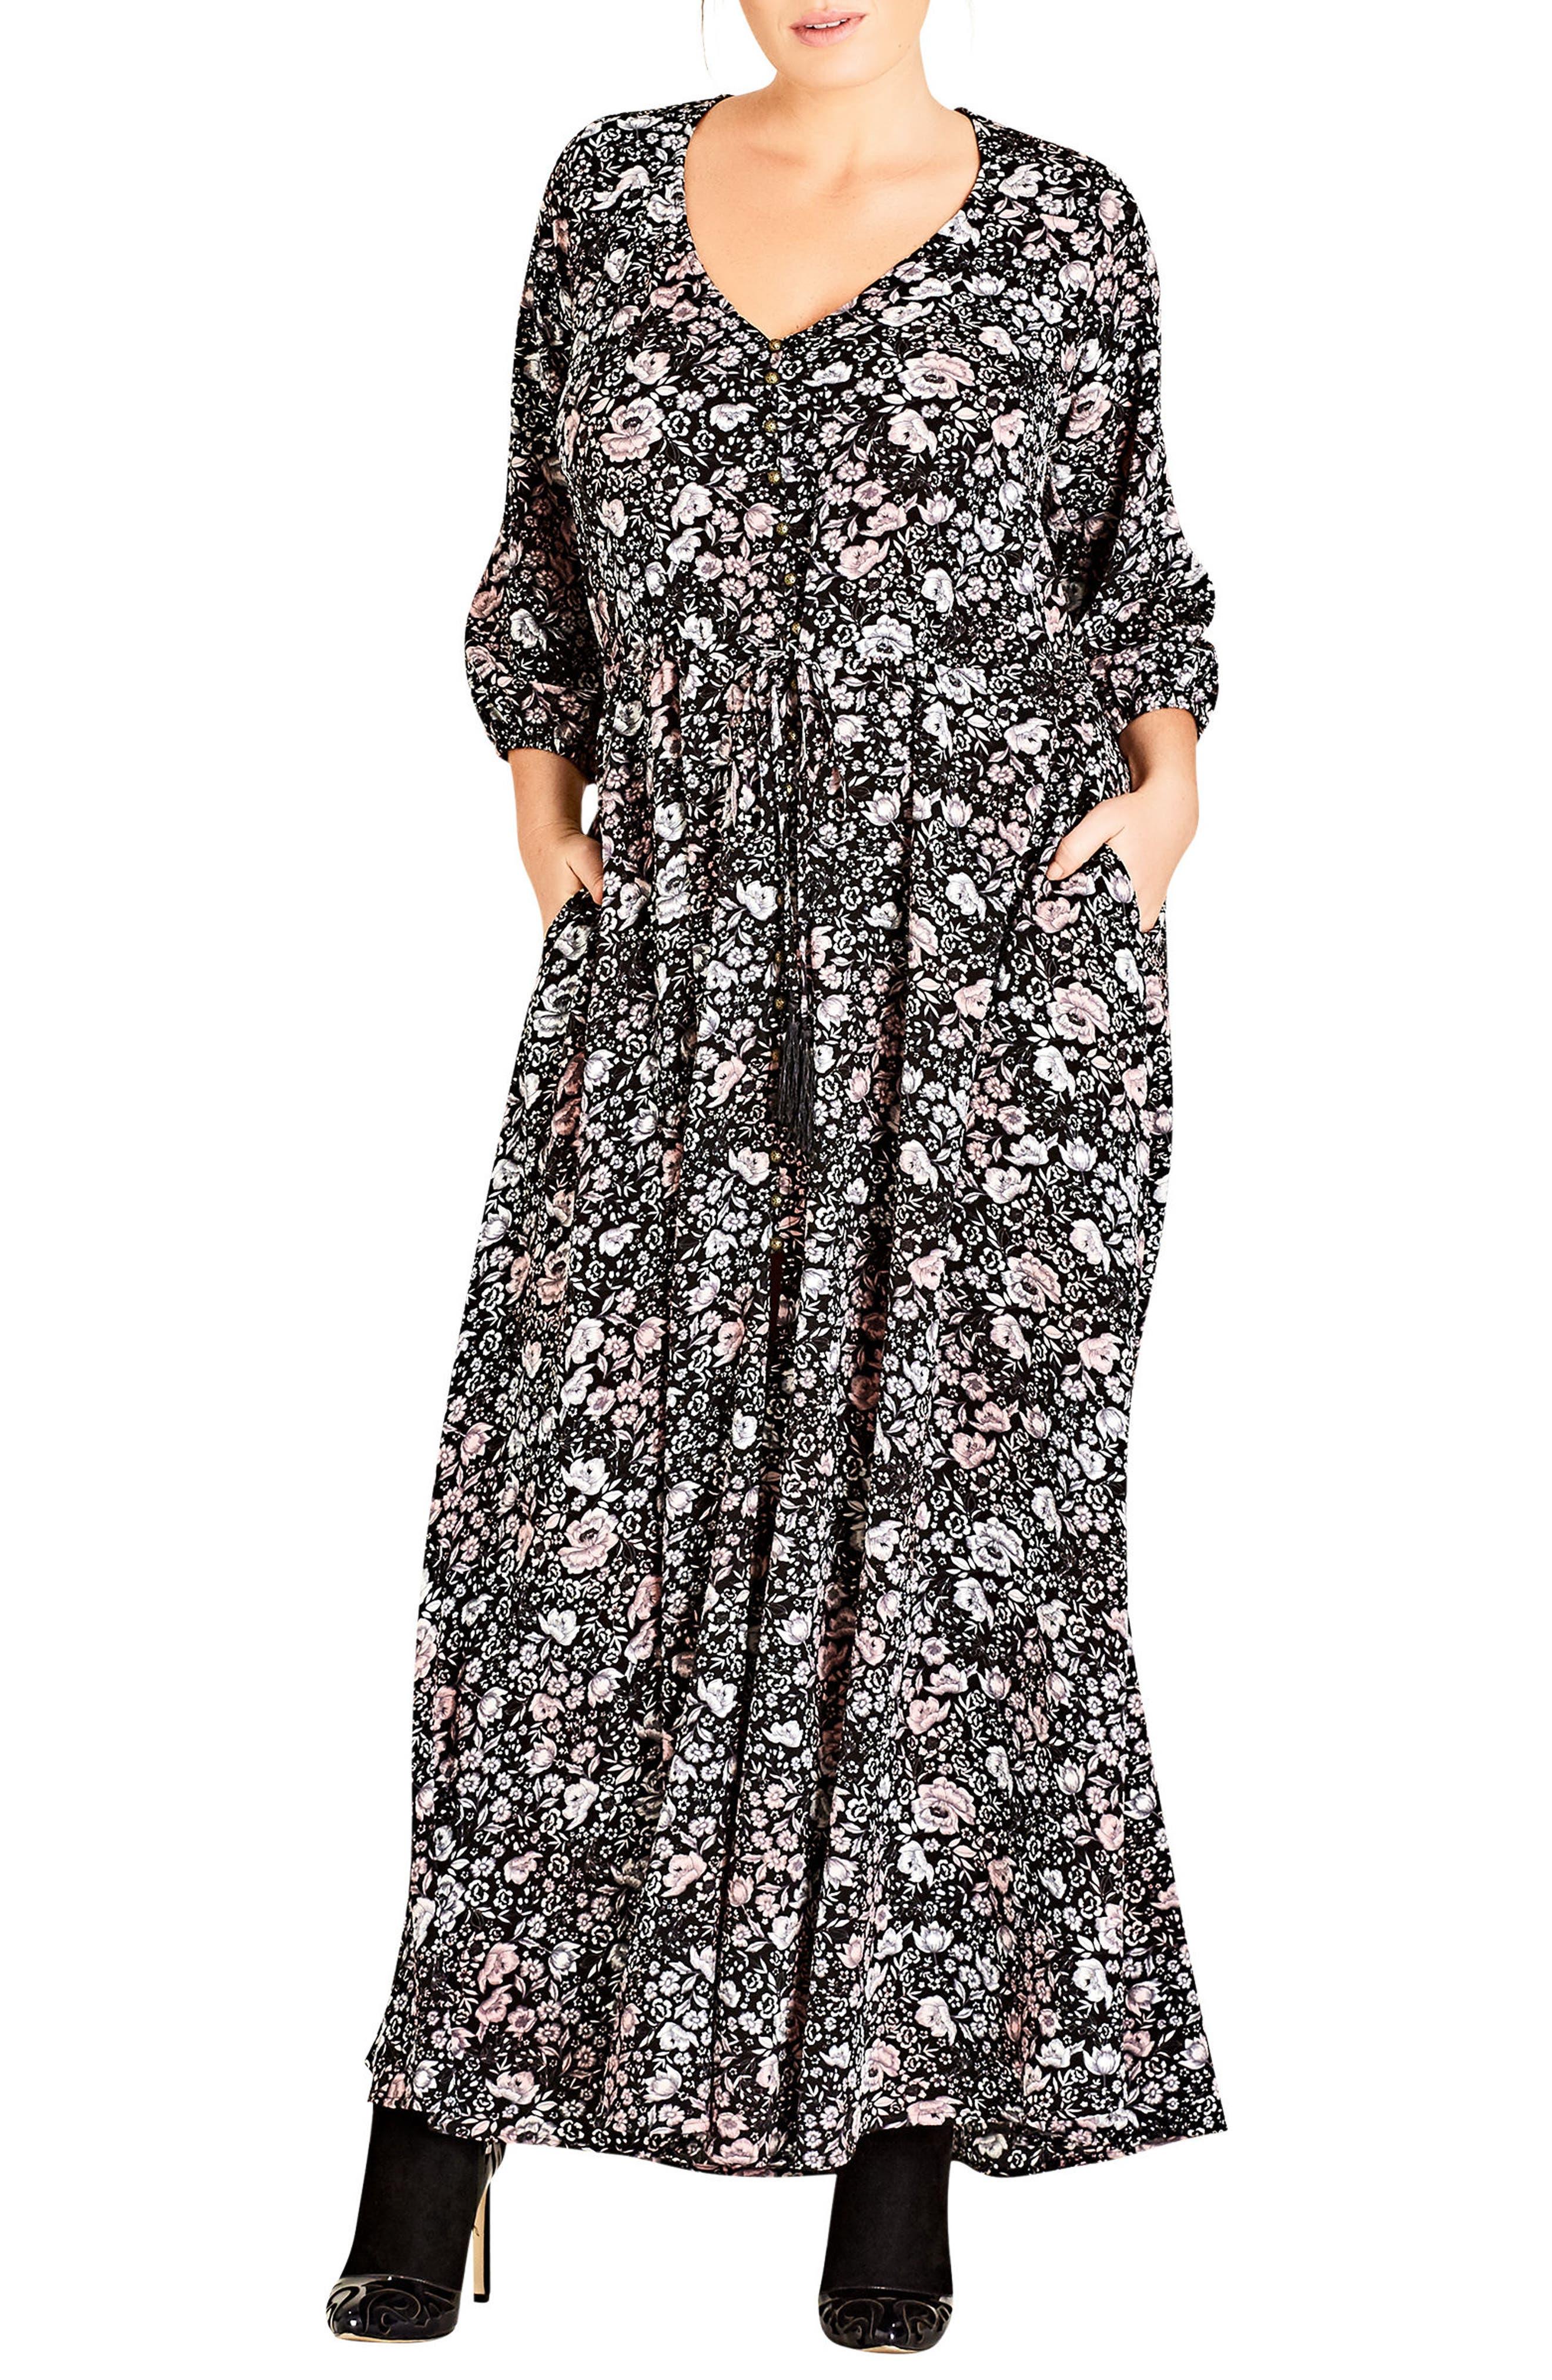 Etched Floral Maxi Dress,                             Main thumbnail 1, color,                             Etched Floral